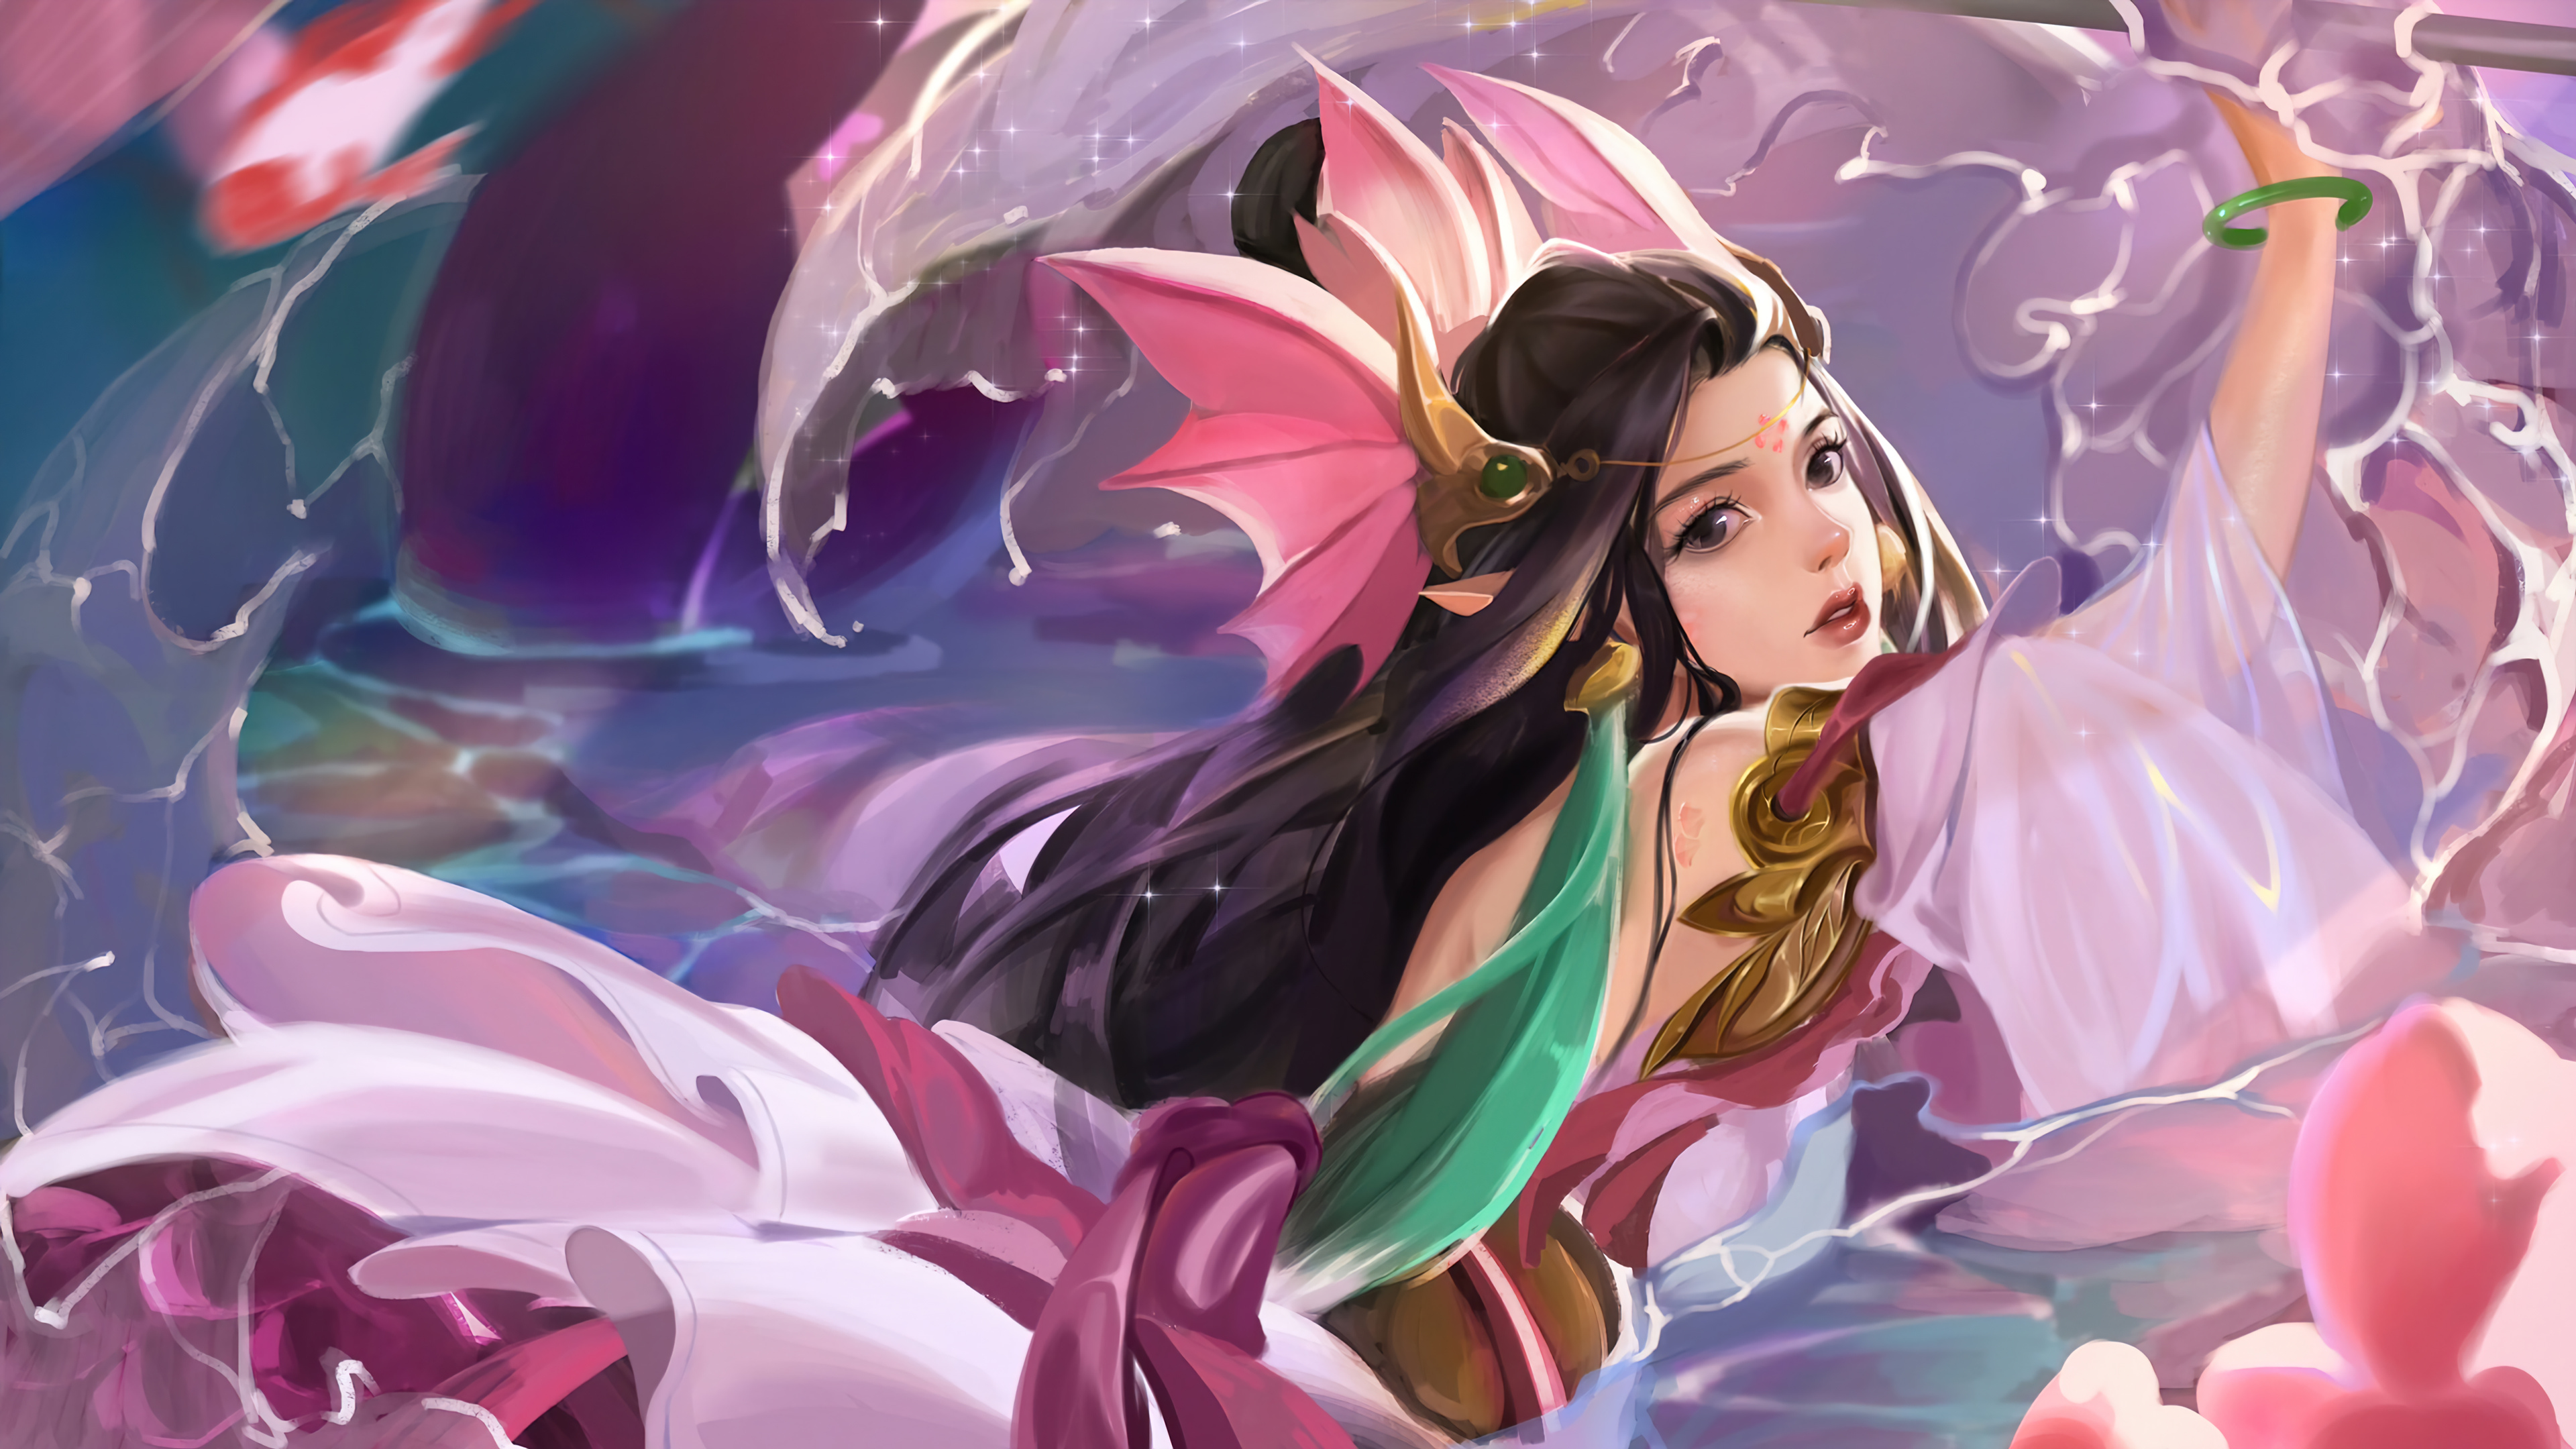 Wallpaper Nami League of Legends